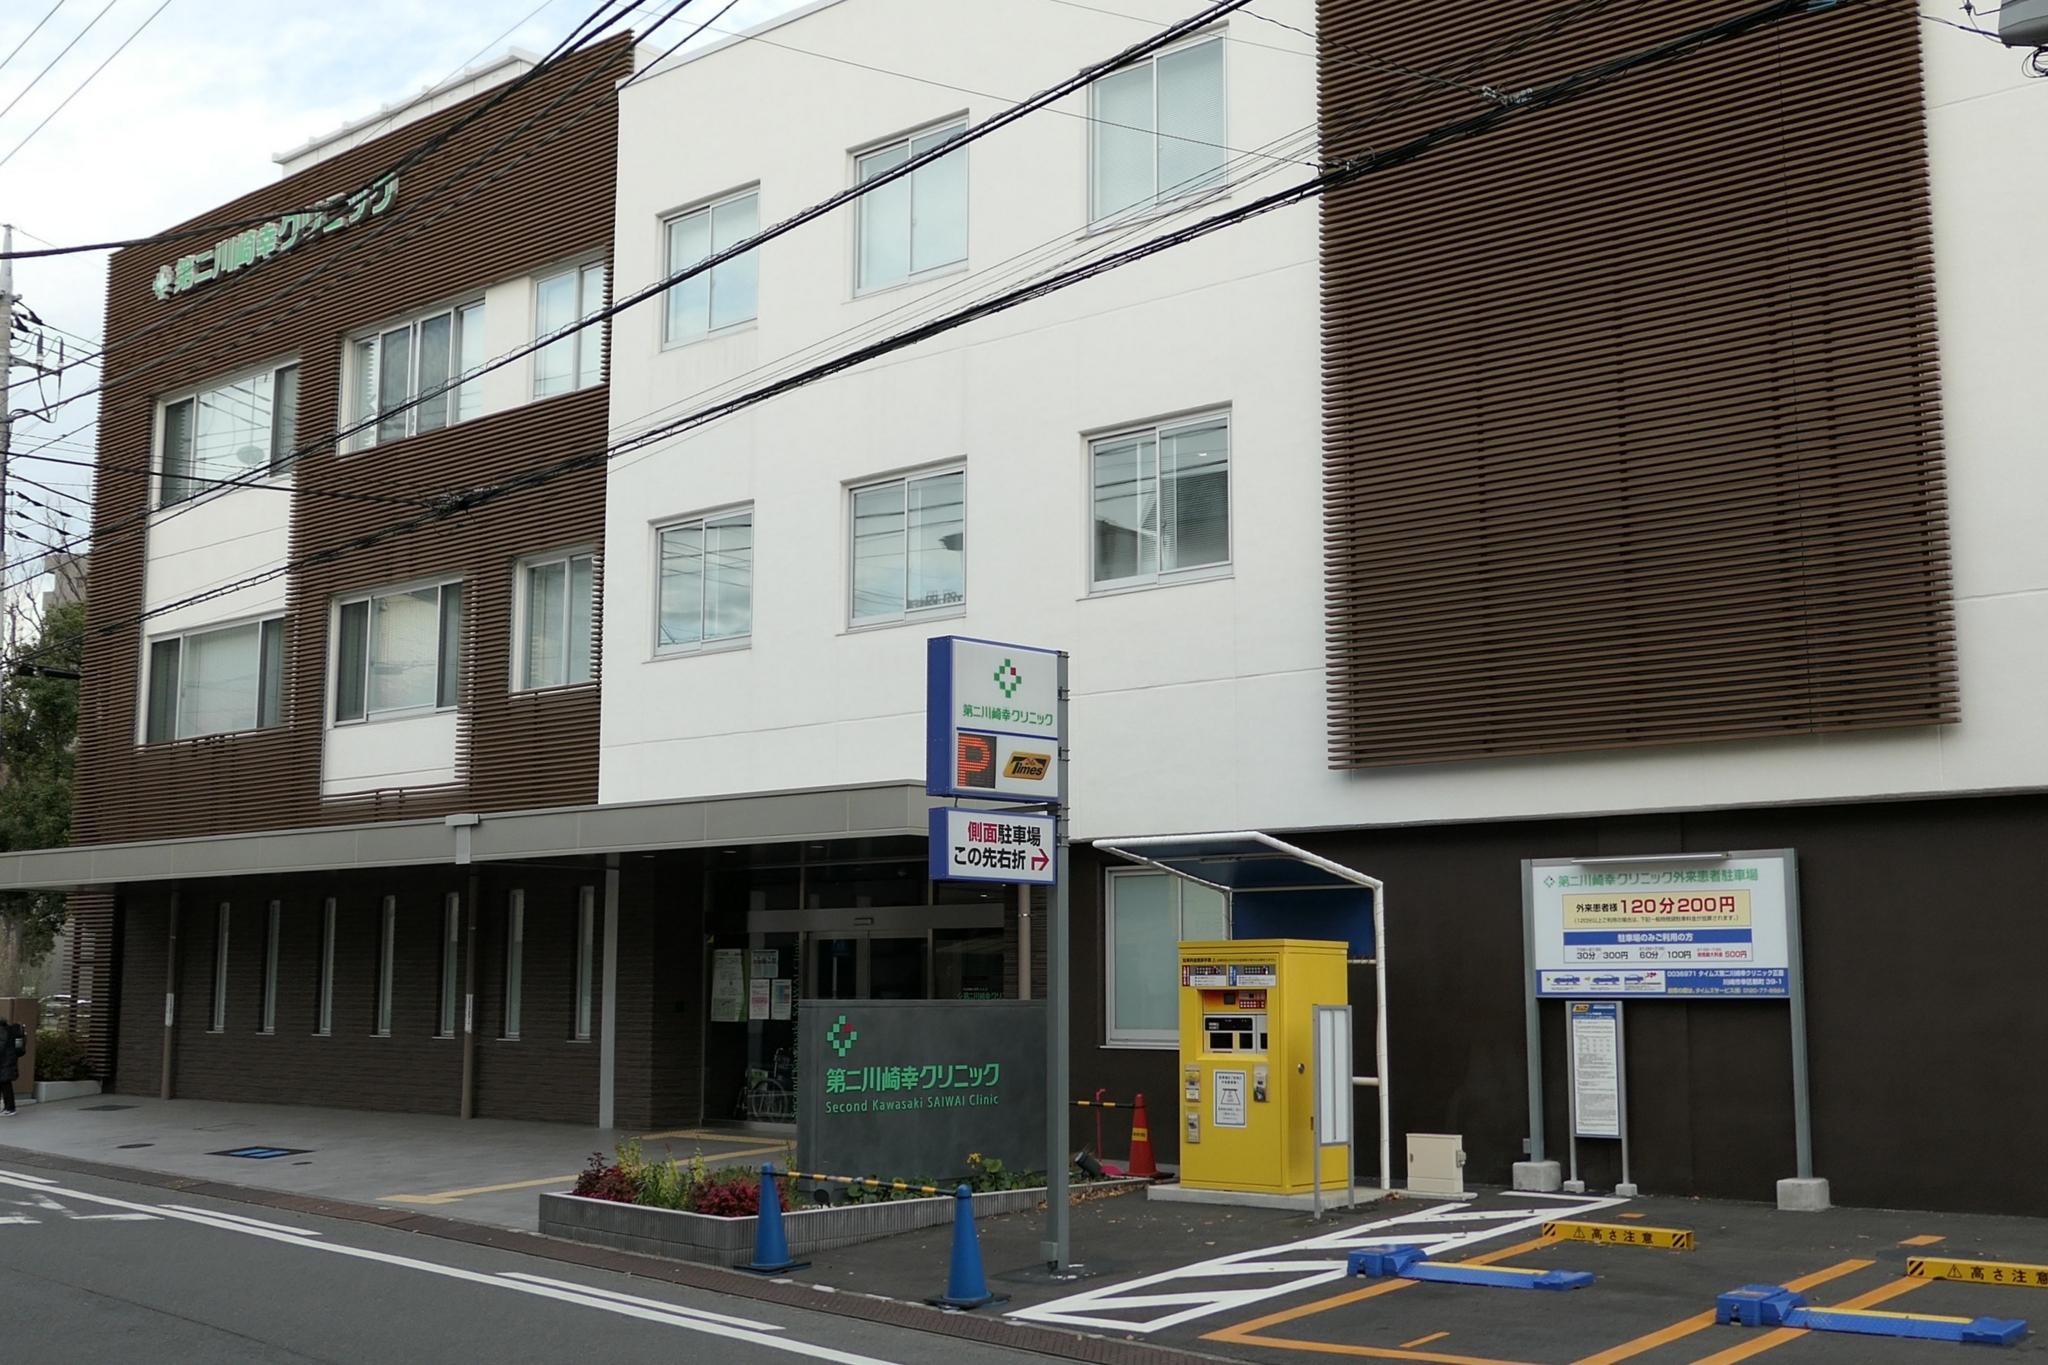 f:id:ToshUeno:20161229080257j:plain